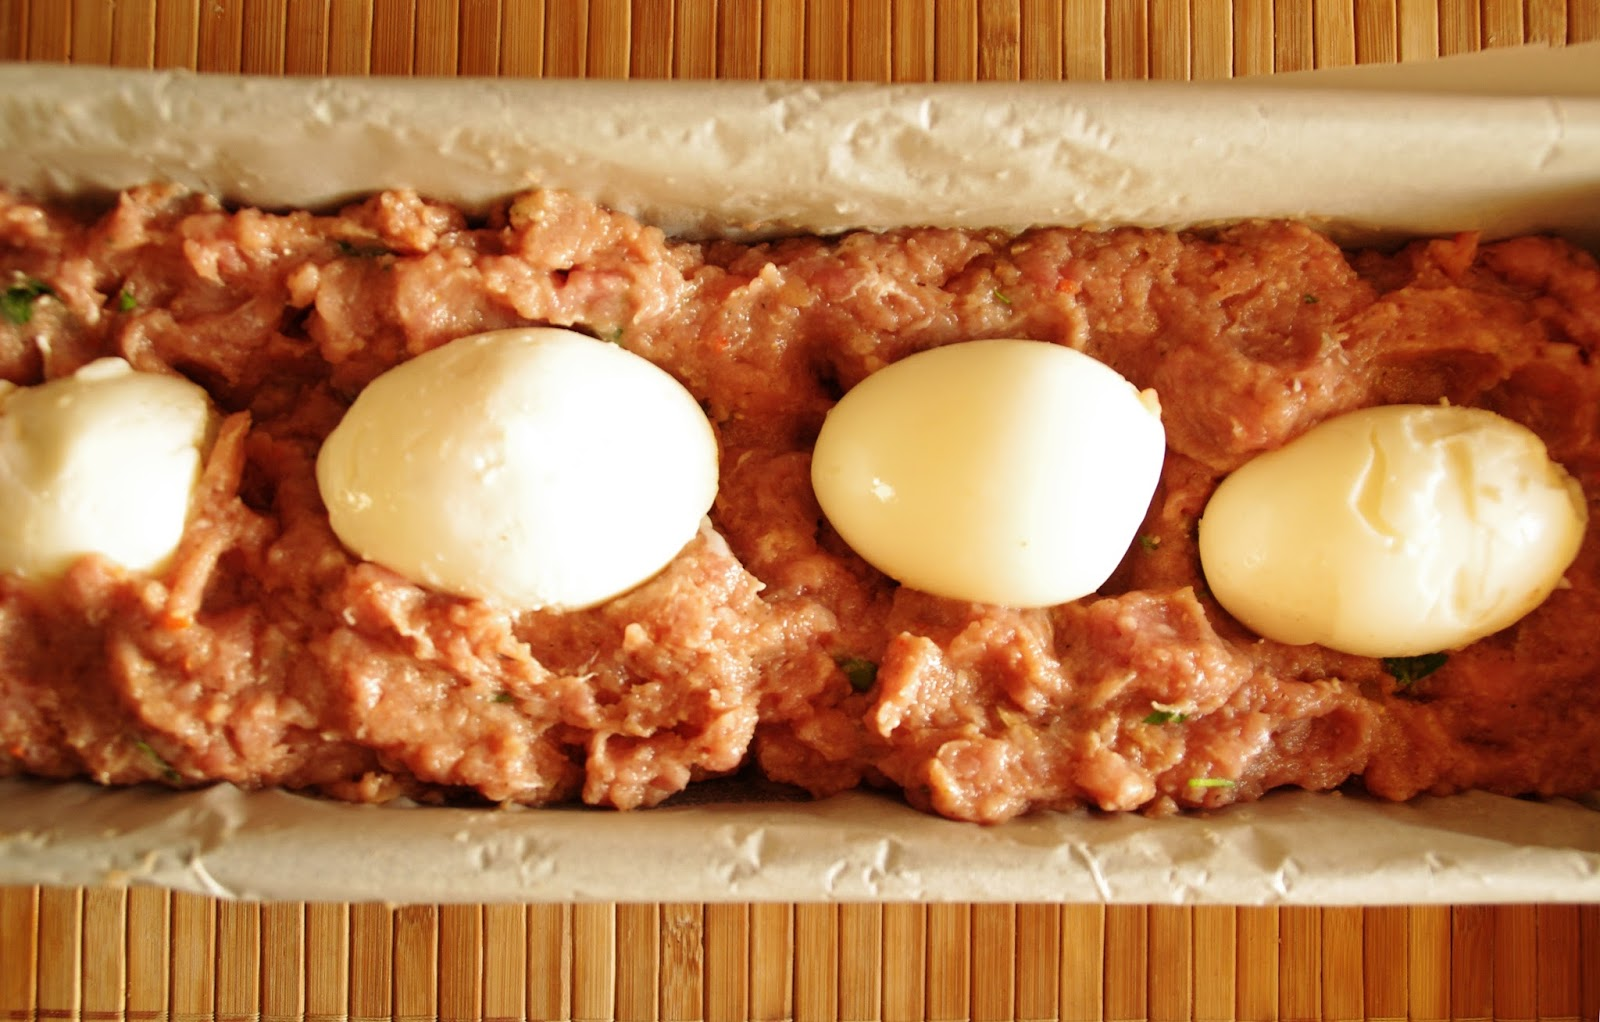 carne picada rellena de huevo duro